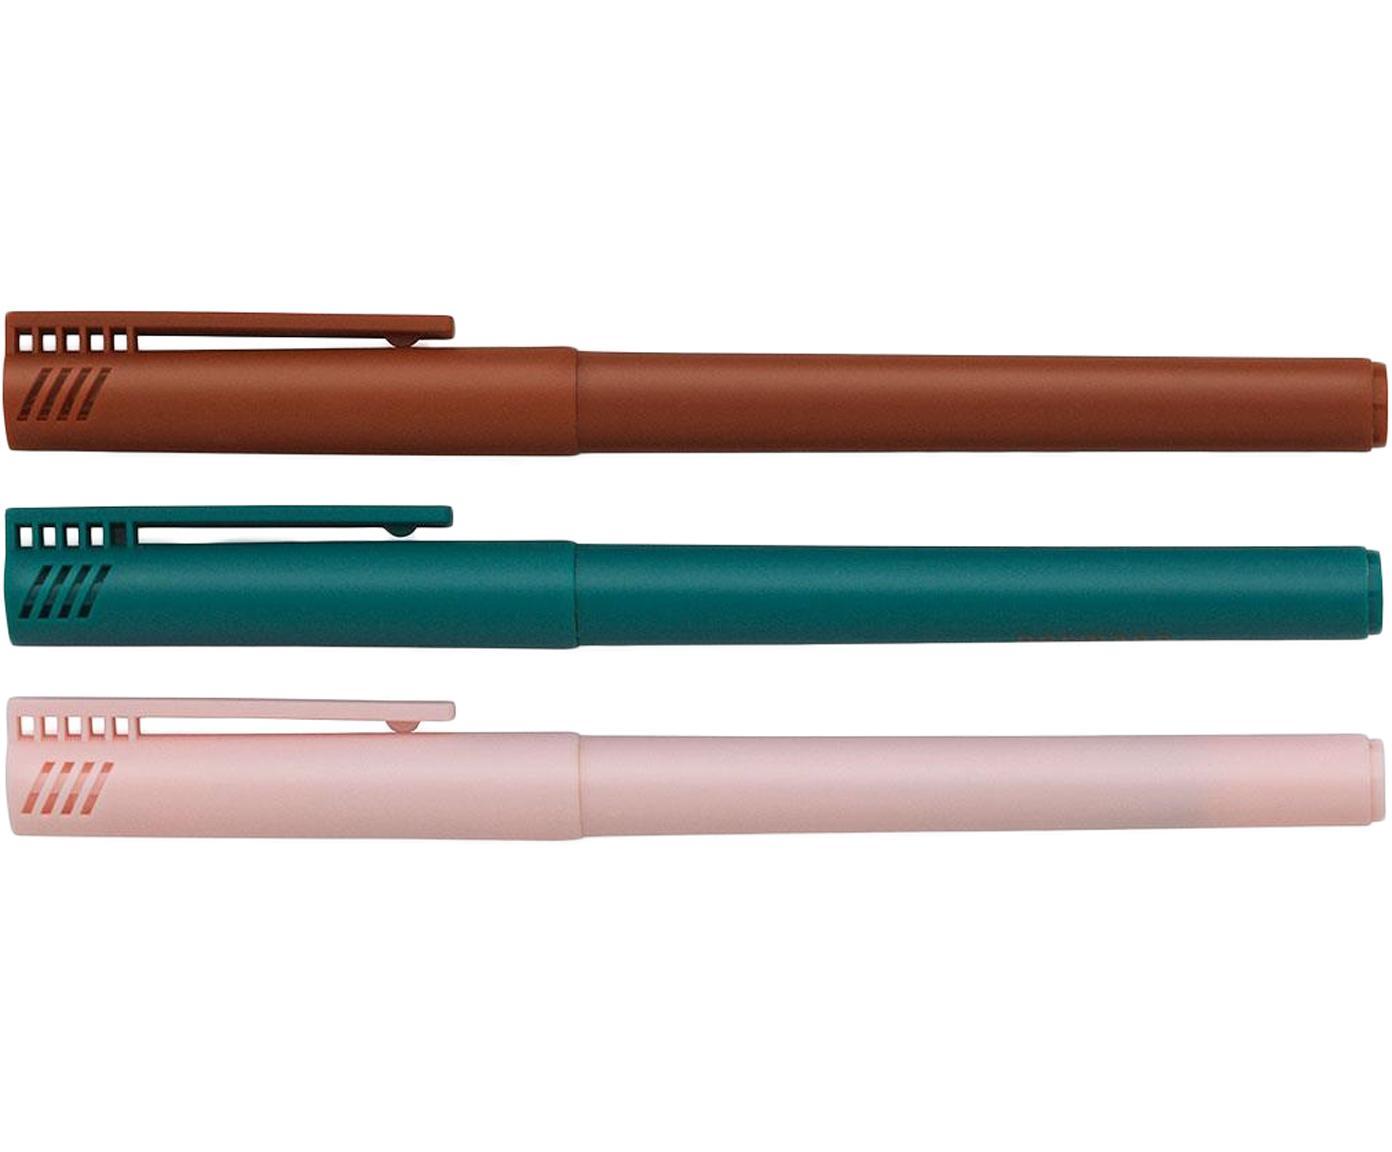 Finelinersset Mix, 3-delig, Kunststof, Blauw, rood, roze, L 14 cm